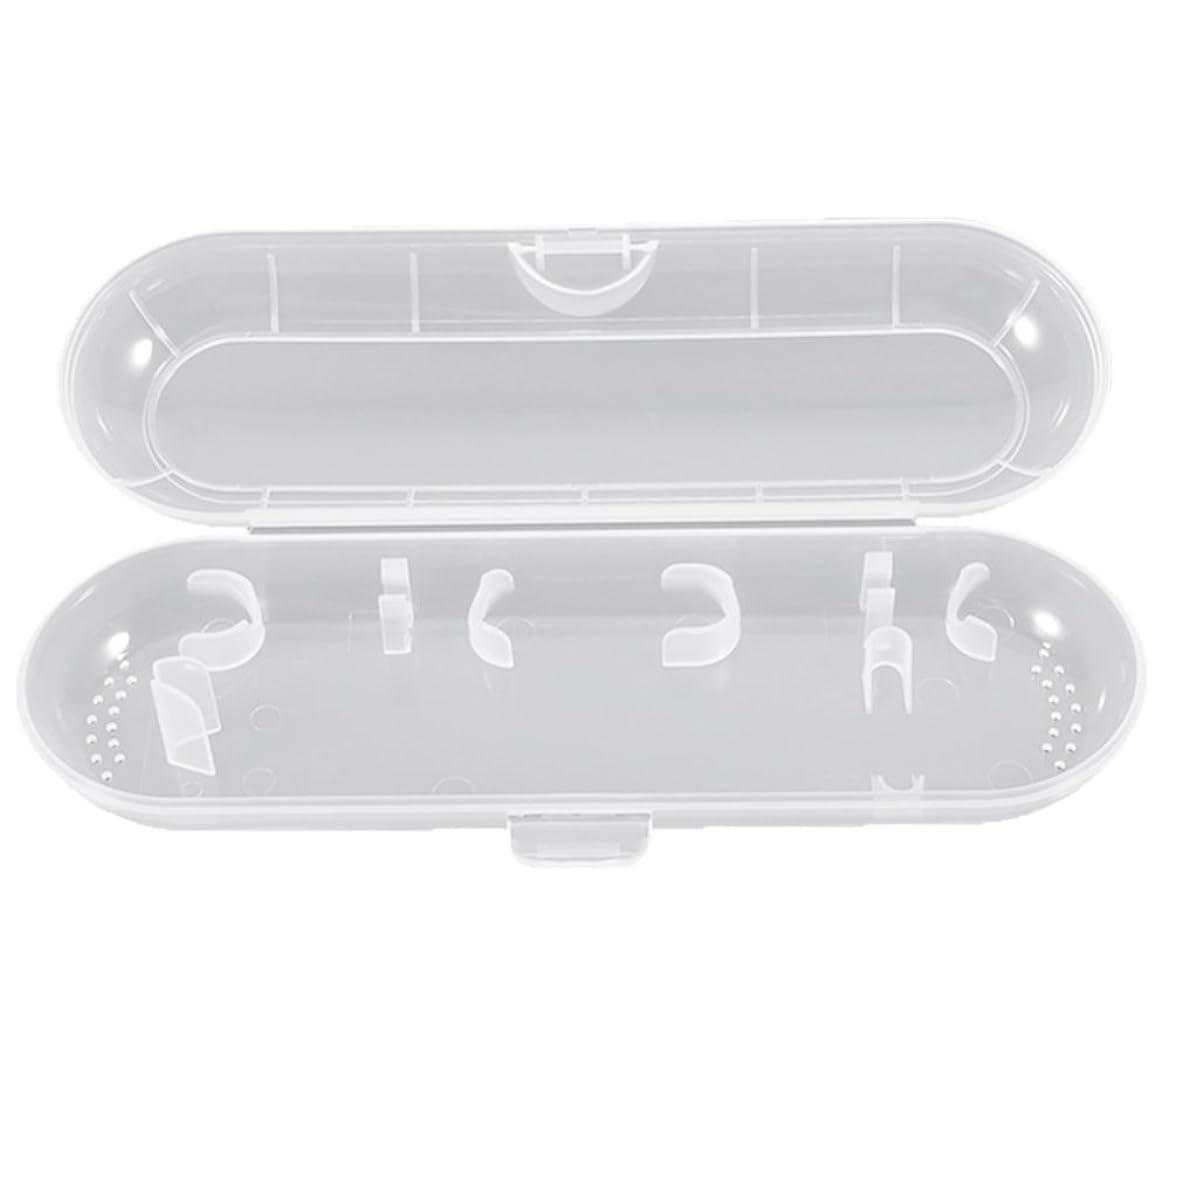 Honel 透明 電動歯ブラシ収納ボックス プラスチック 電動歯ブラシケース 収納ケース ブラウン オーラルB対応